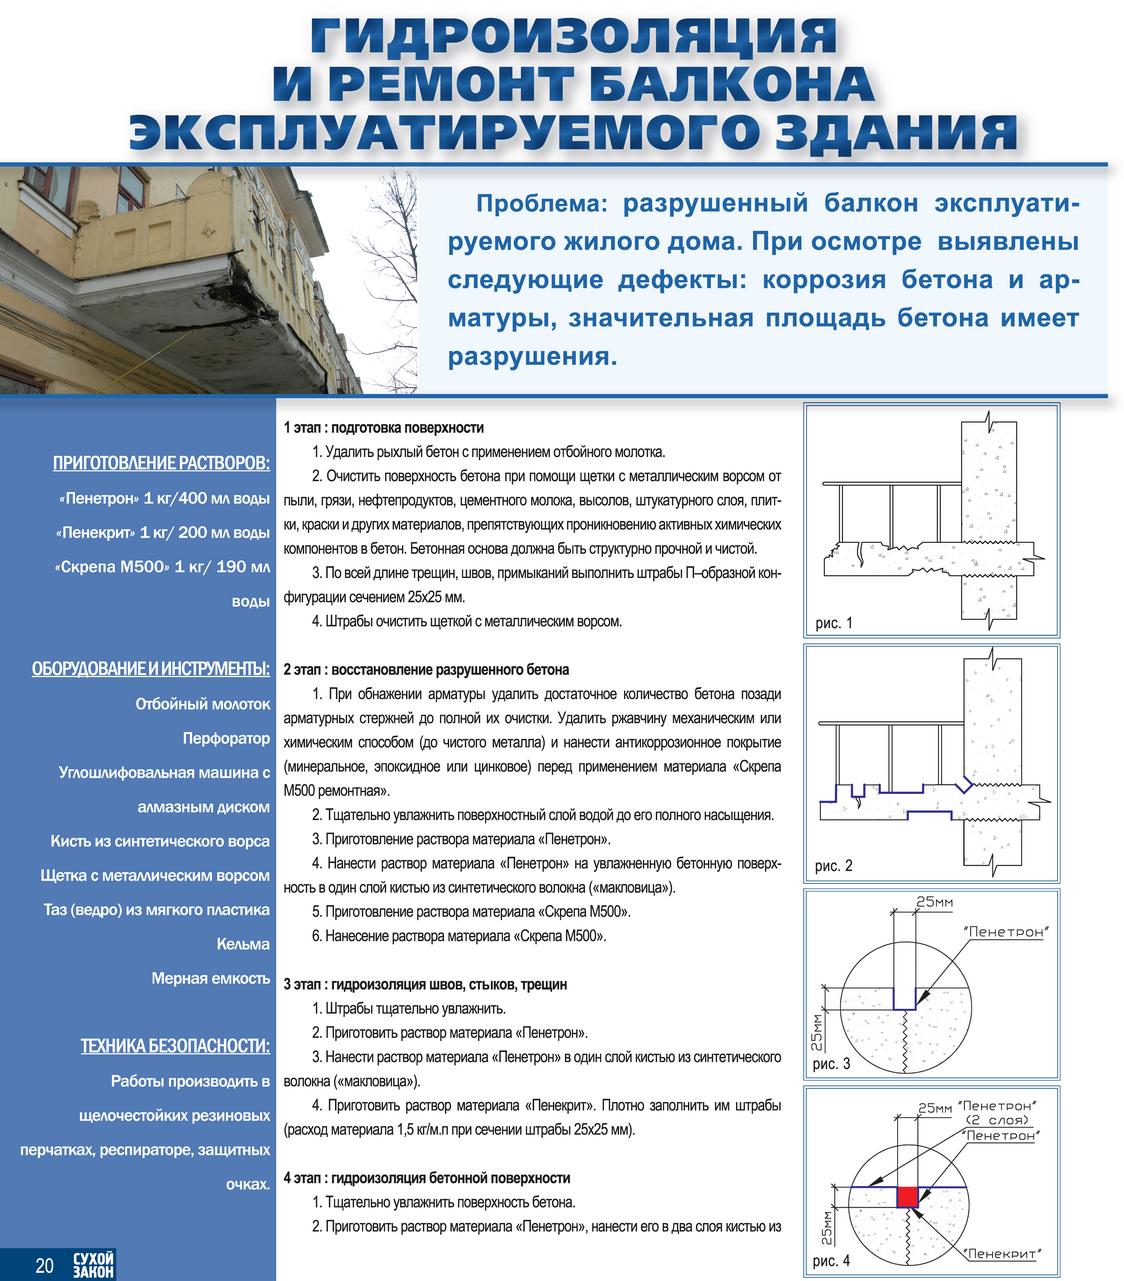 Гидроизоляция балкона в жилом доме - пенетрон казахстан - ма.